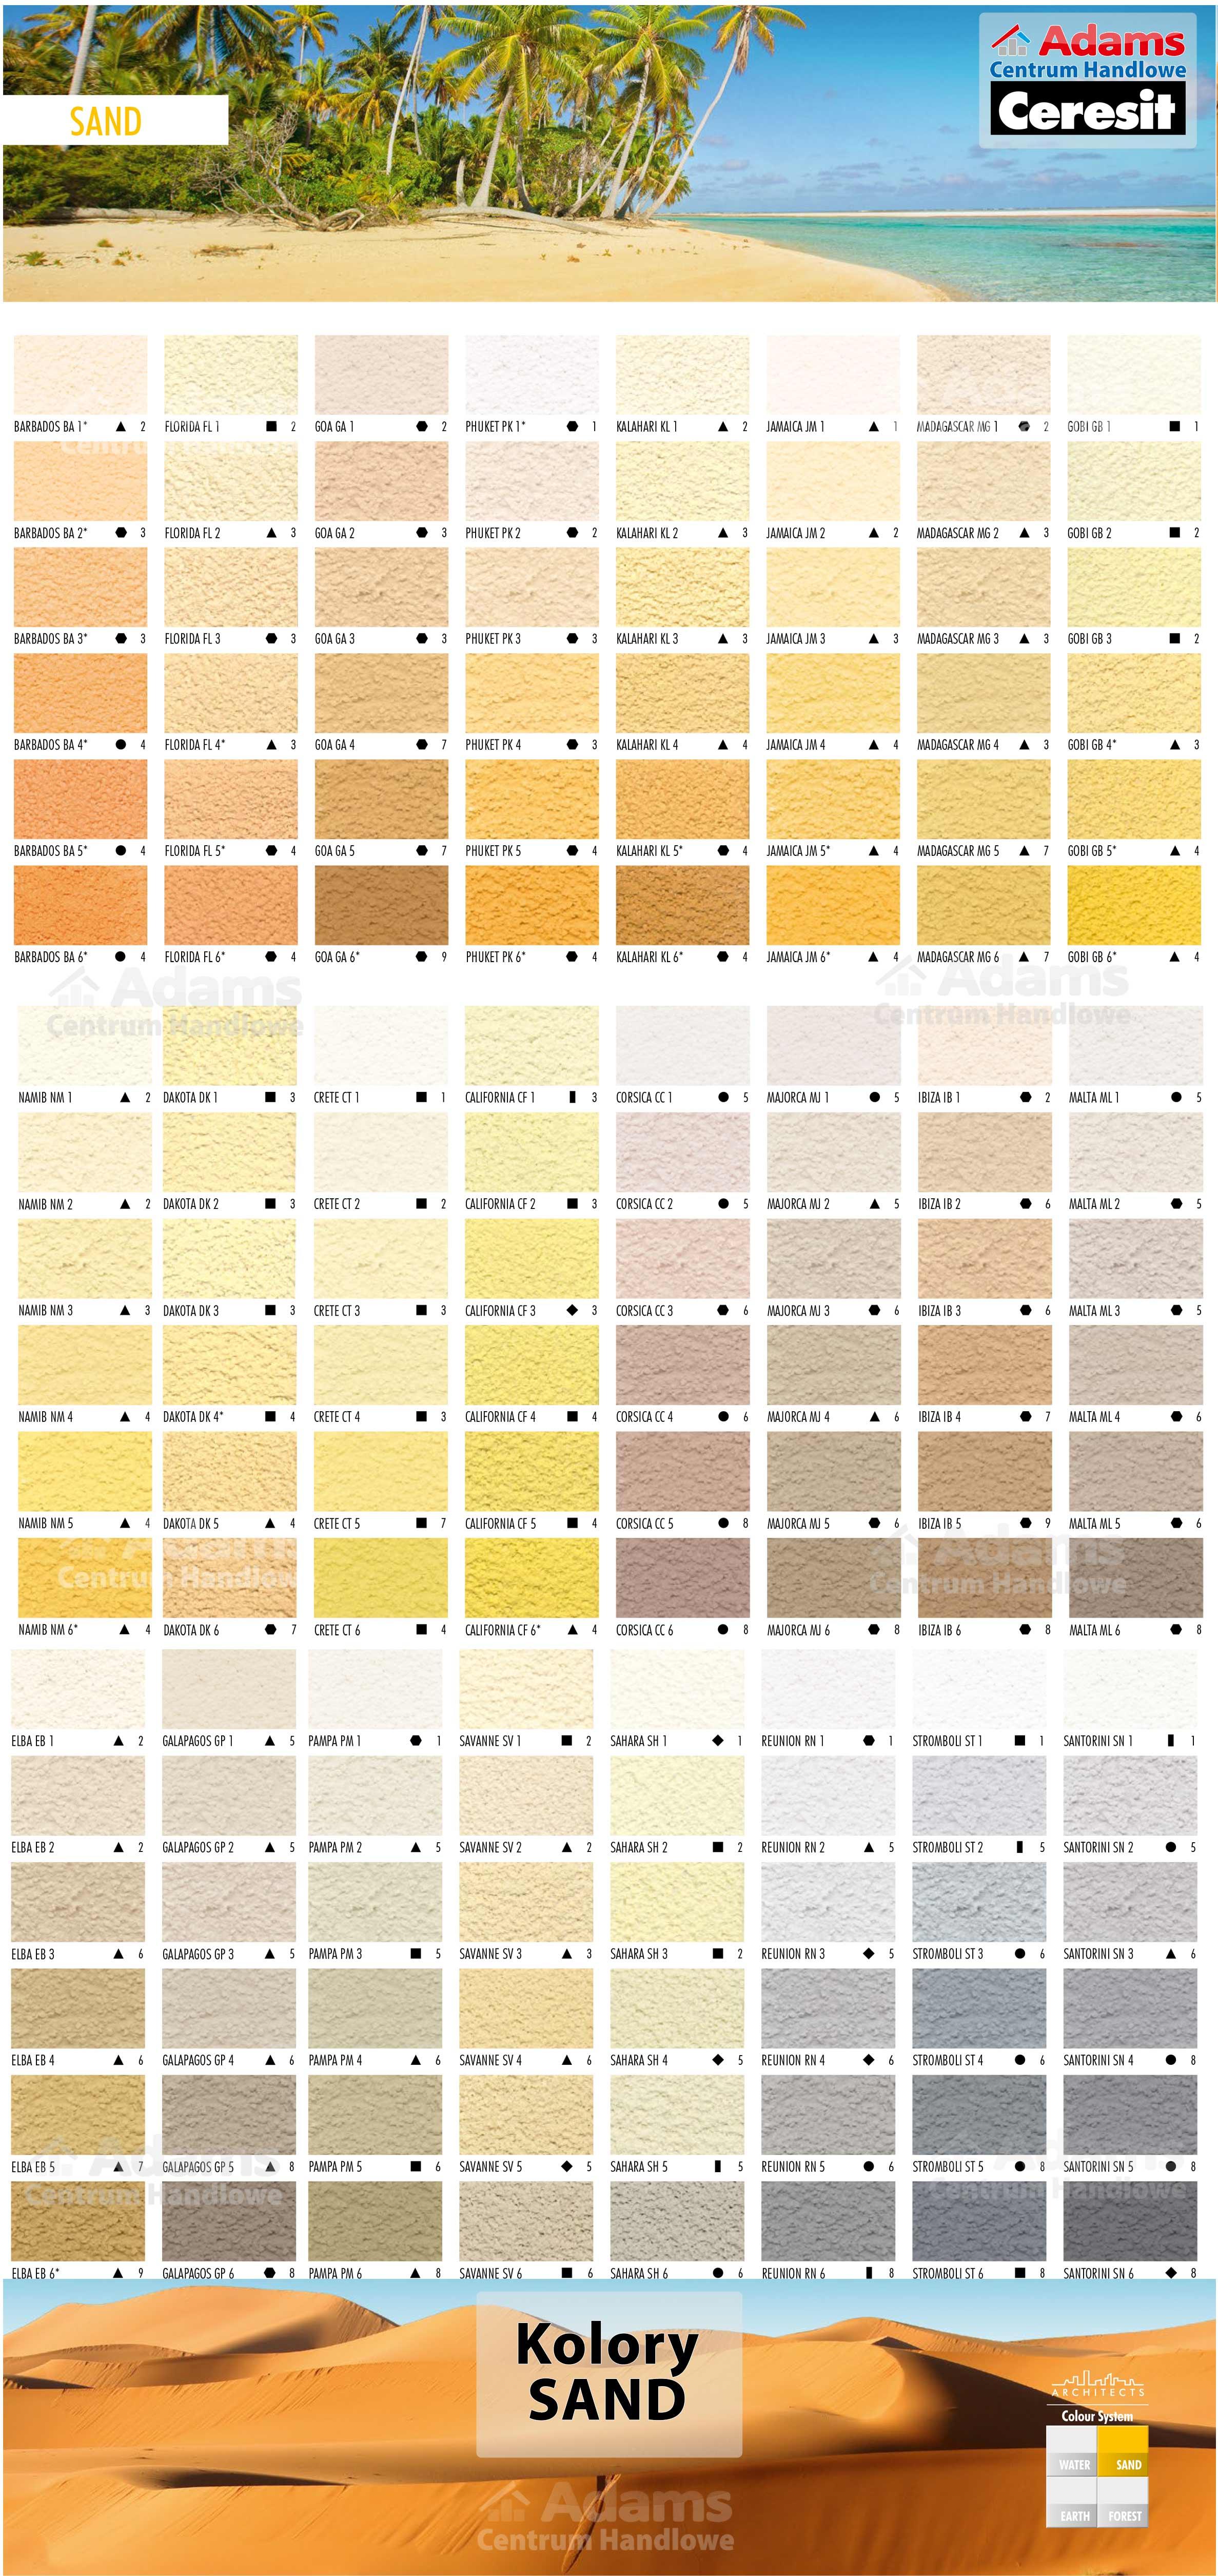 Wzornik Farb I Tynkow Ceresit Adams Centrum Handlowe